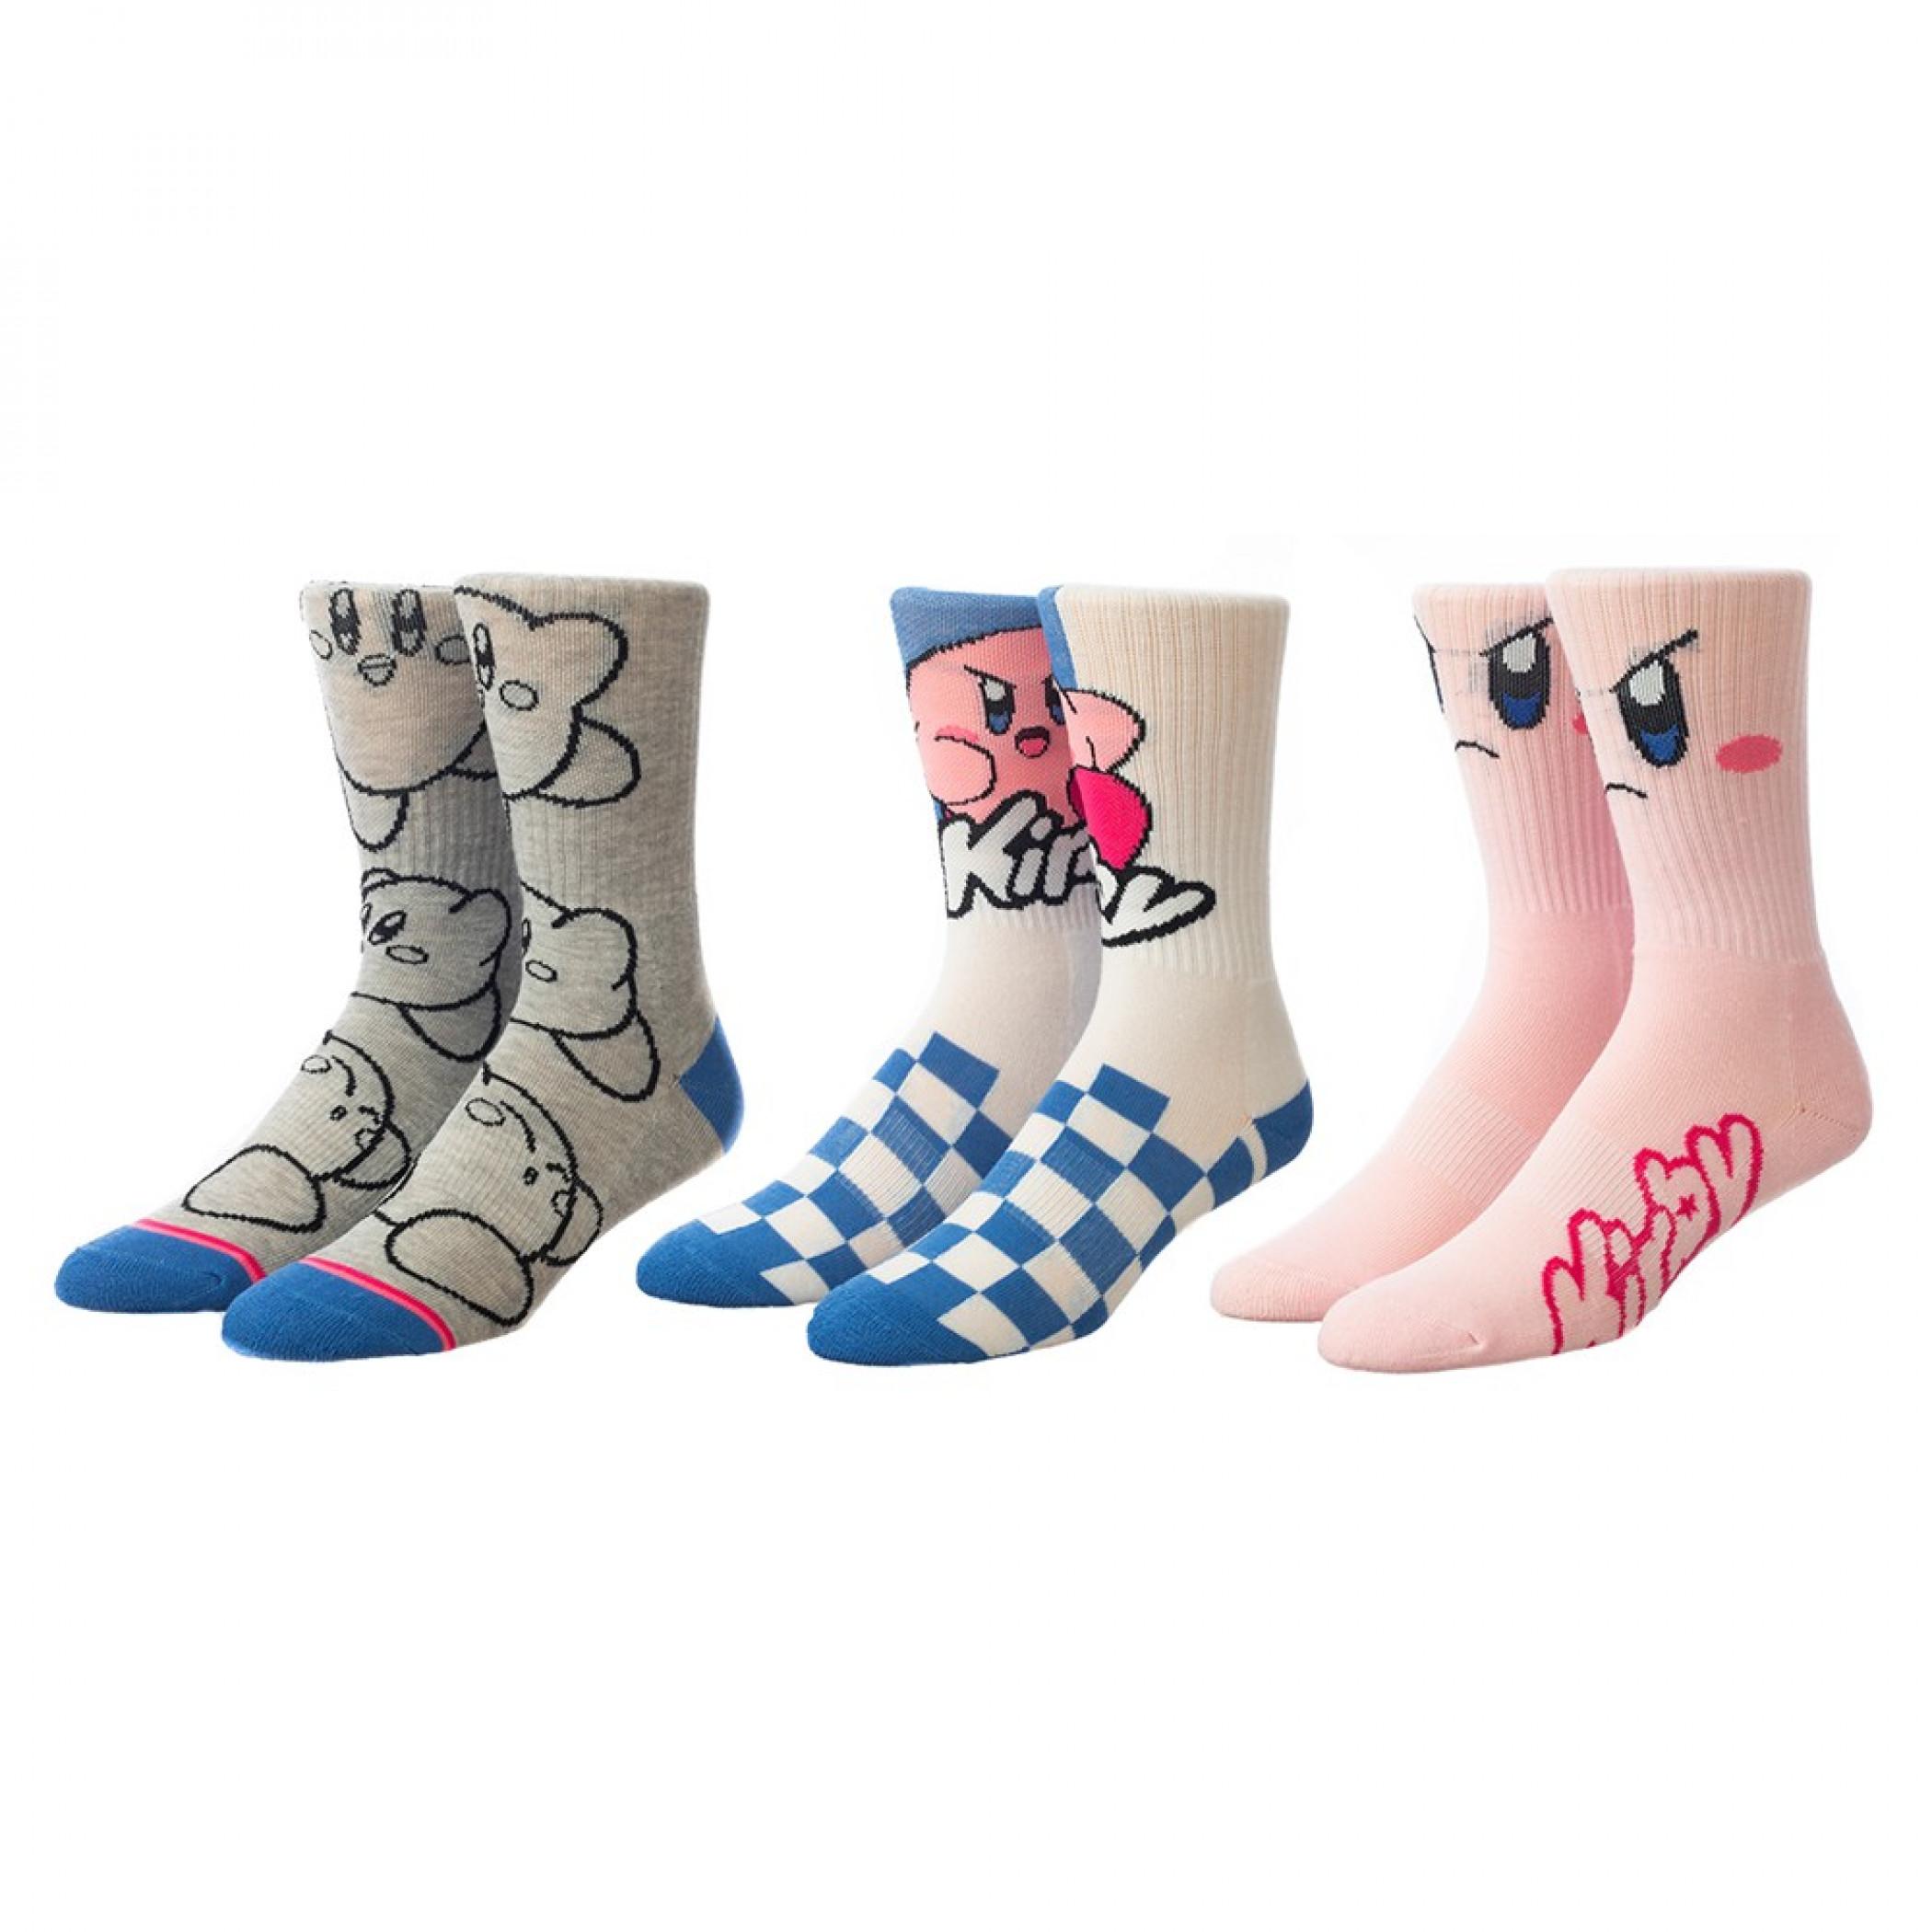 Nintendo Kirby 3-Pair Pack of Women's Casual Crew Socks